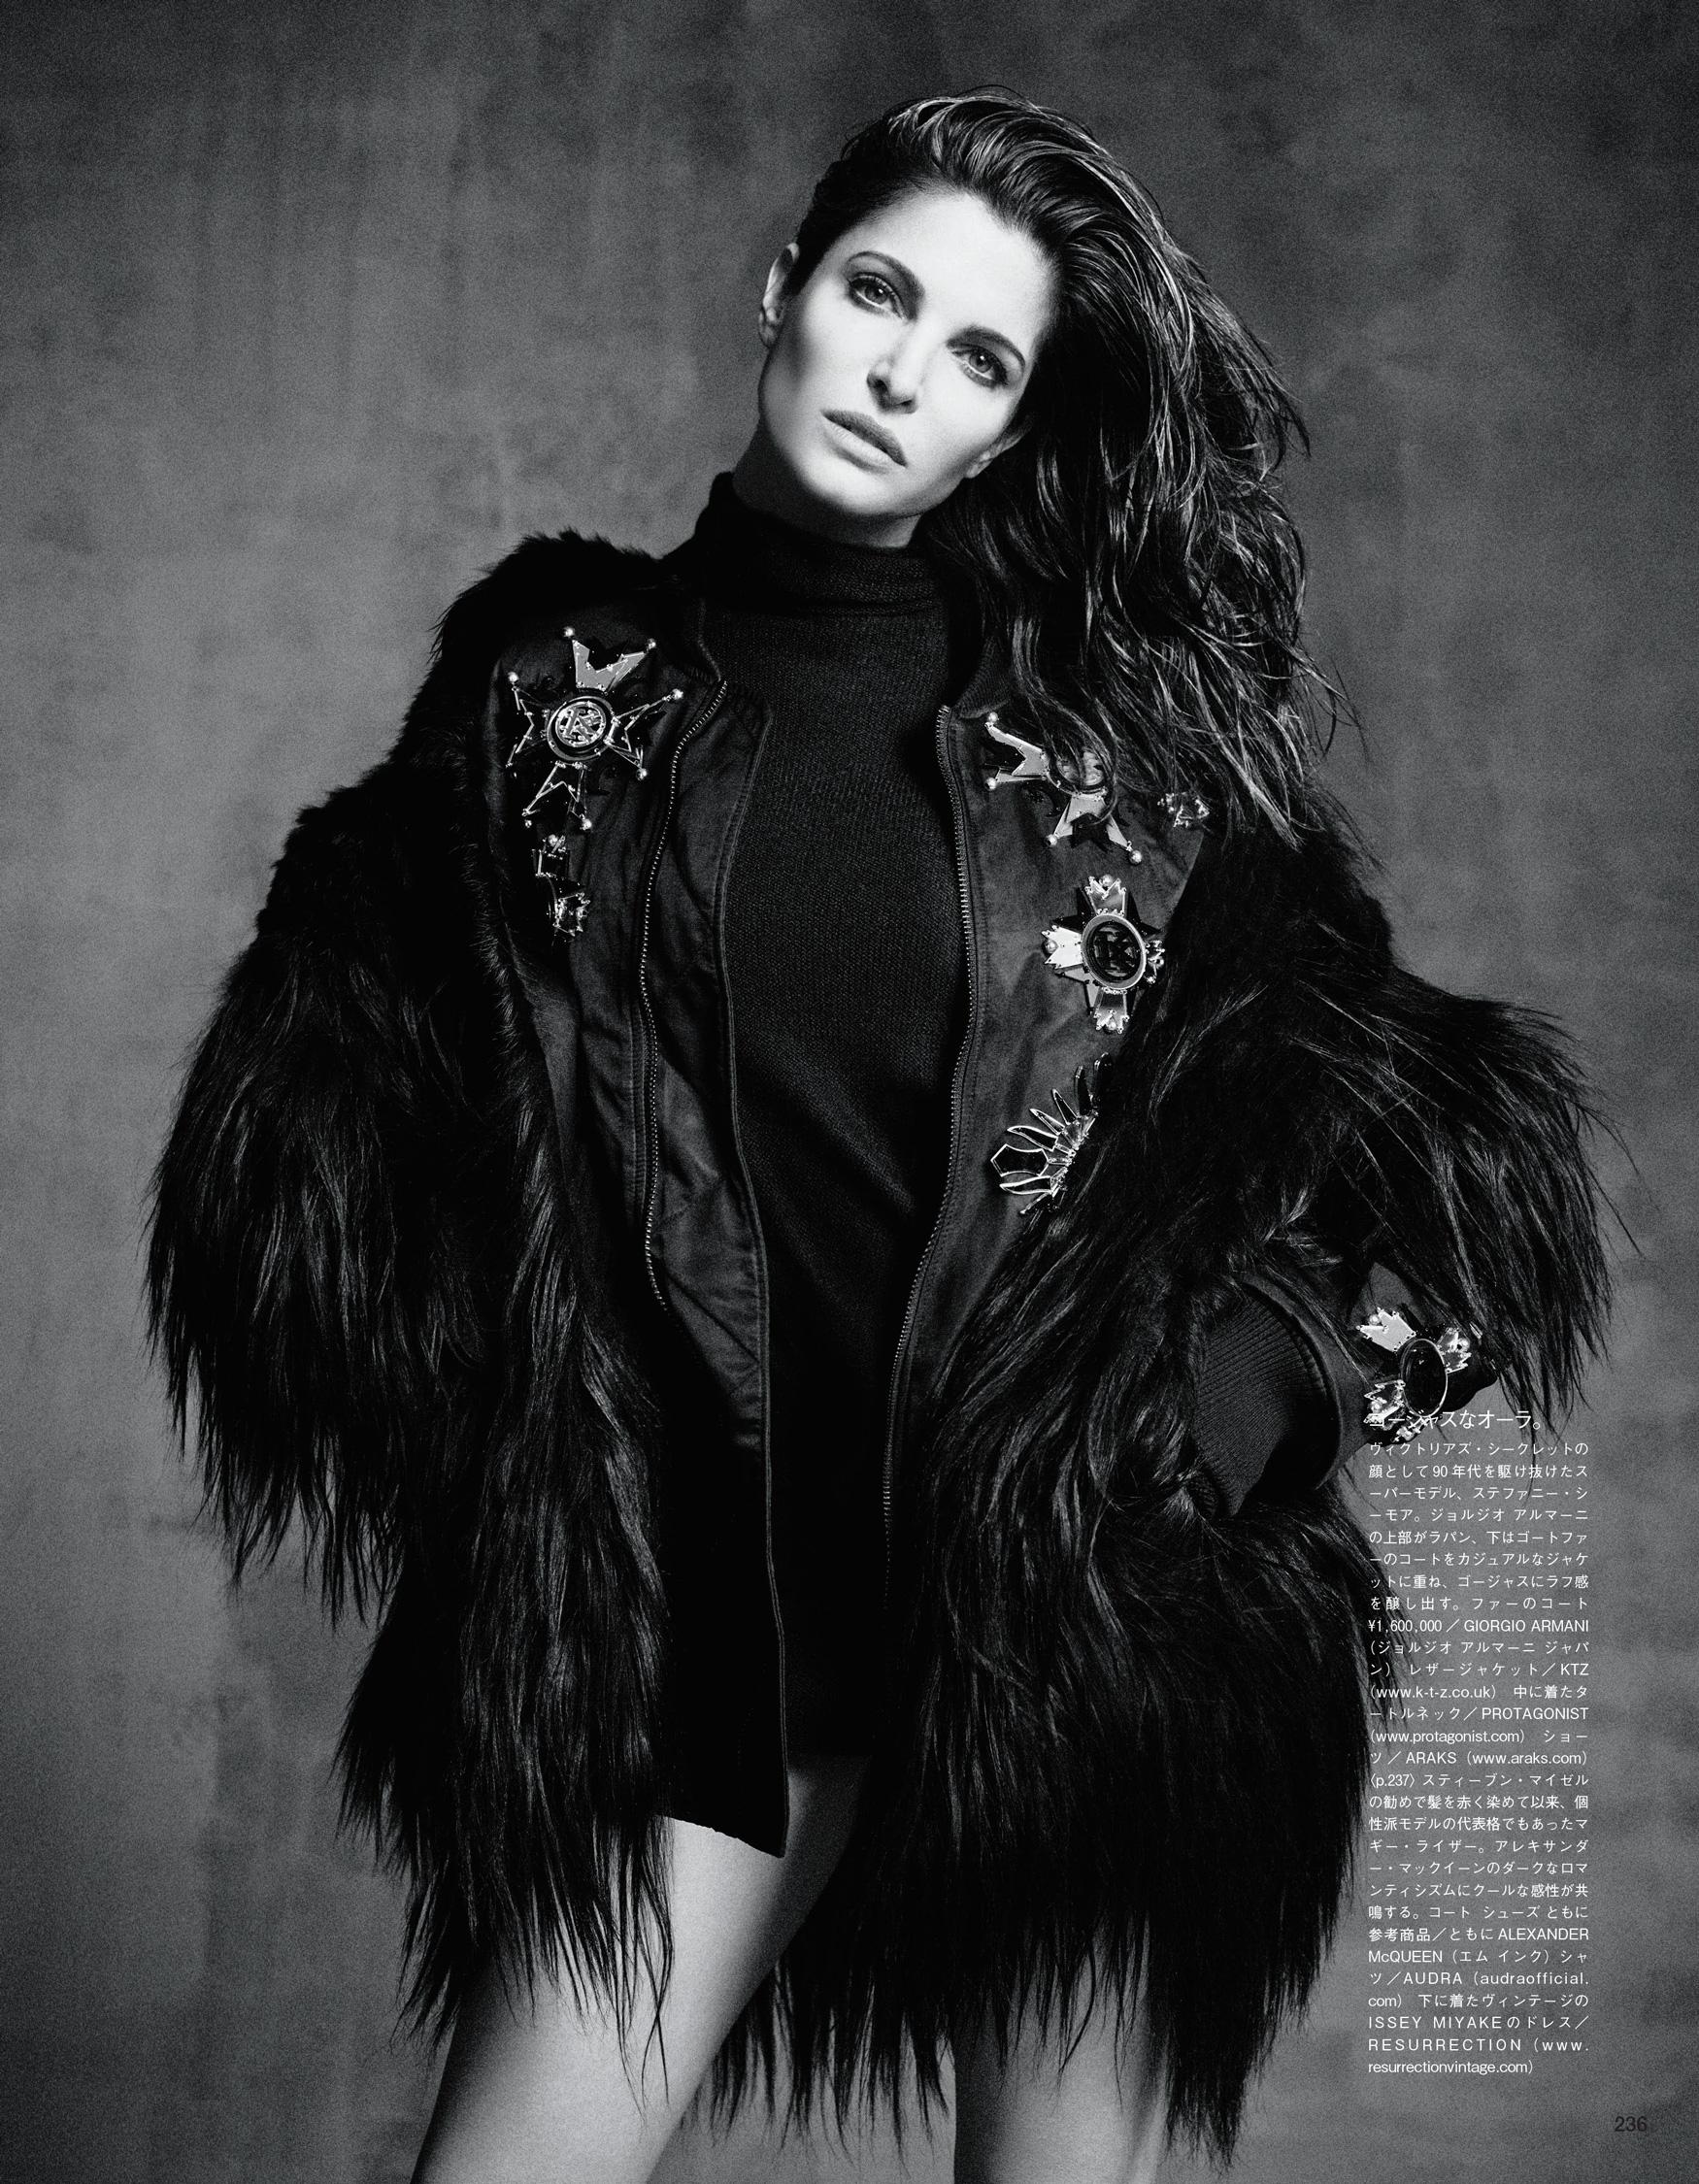 Giovanna-Battaglia-The-Icons-Of-Perfections-Vogue-Japan-15th-Anniversary-Issue-Luigi-Iango-V181_236_200-29.jpg